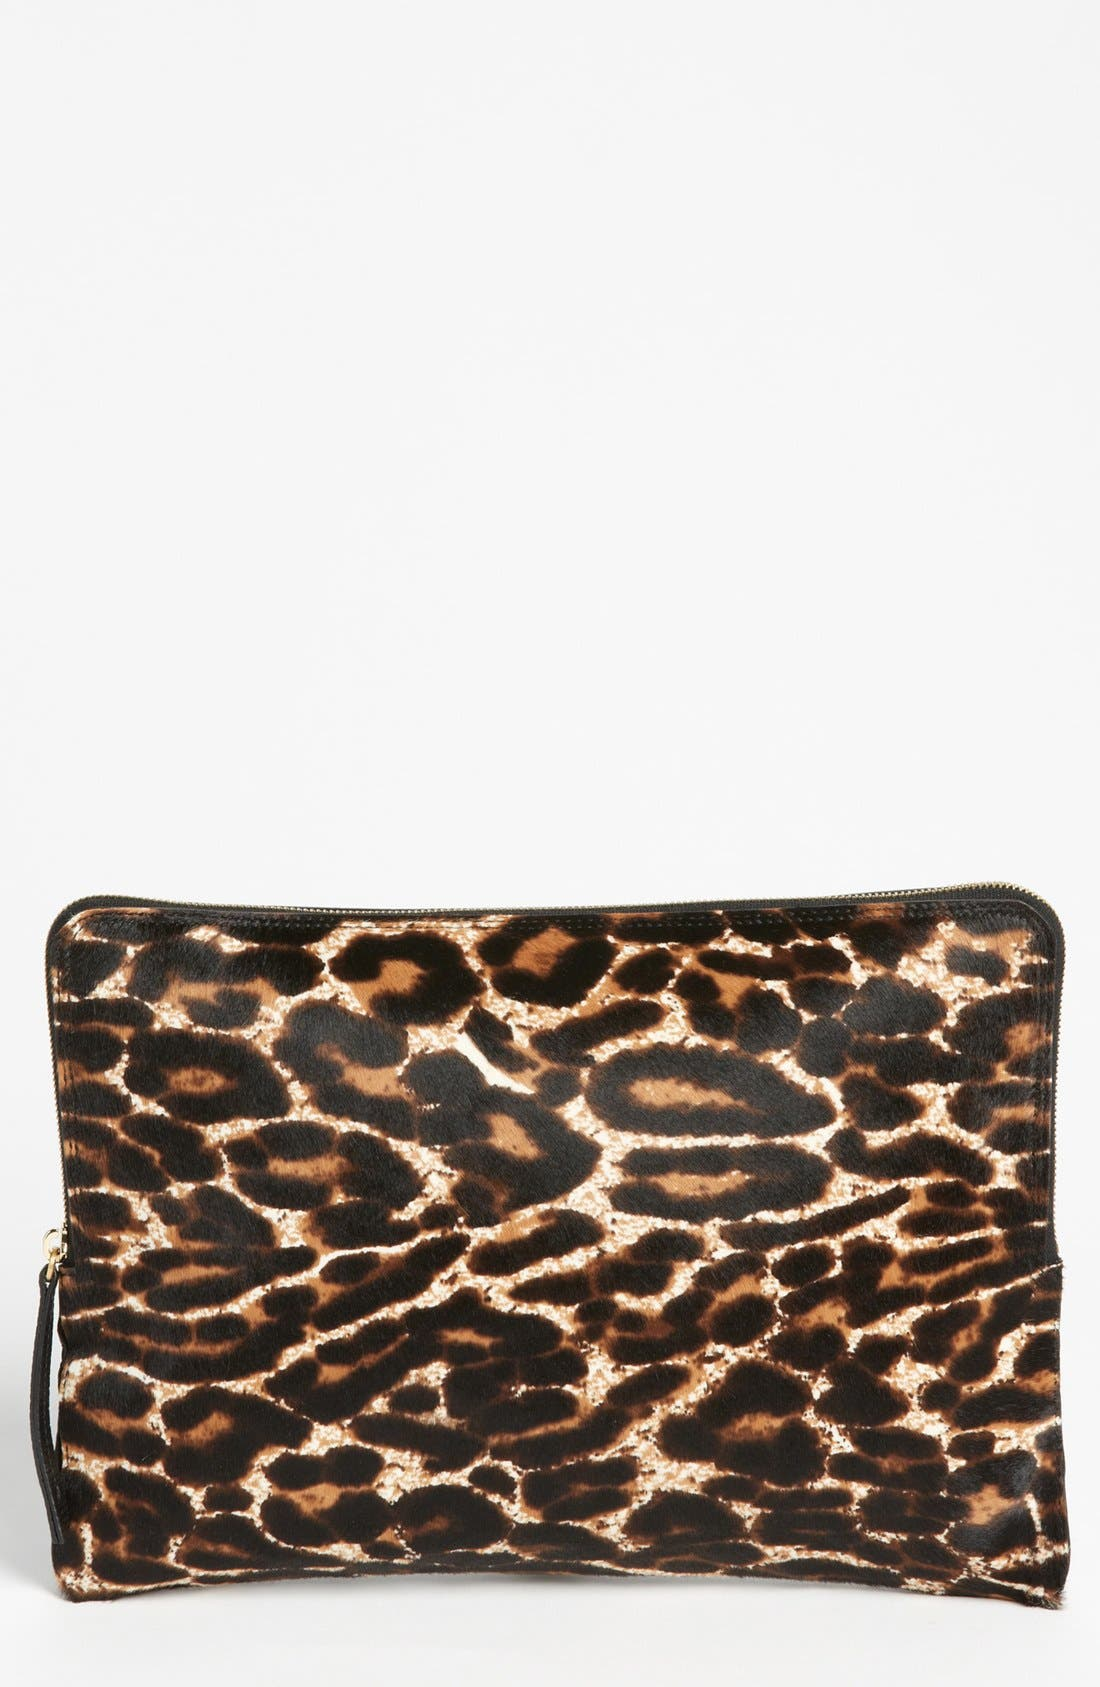 Main Image - Lanvin 'Oversize' Leopard Print Calf Hair Clutch